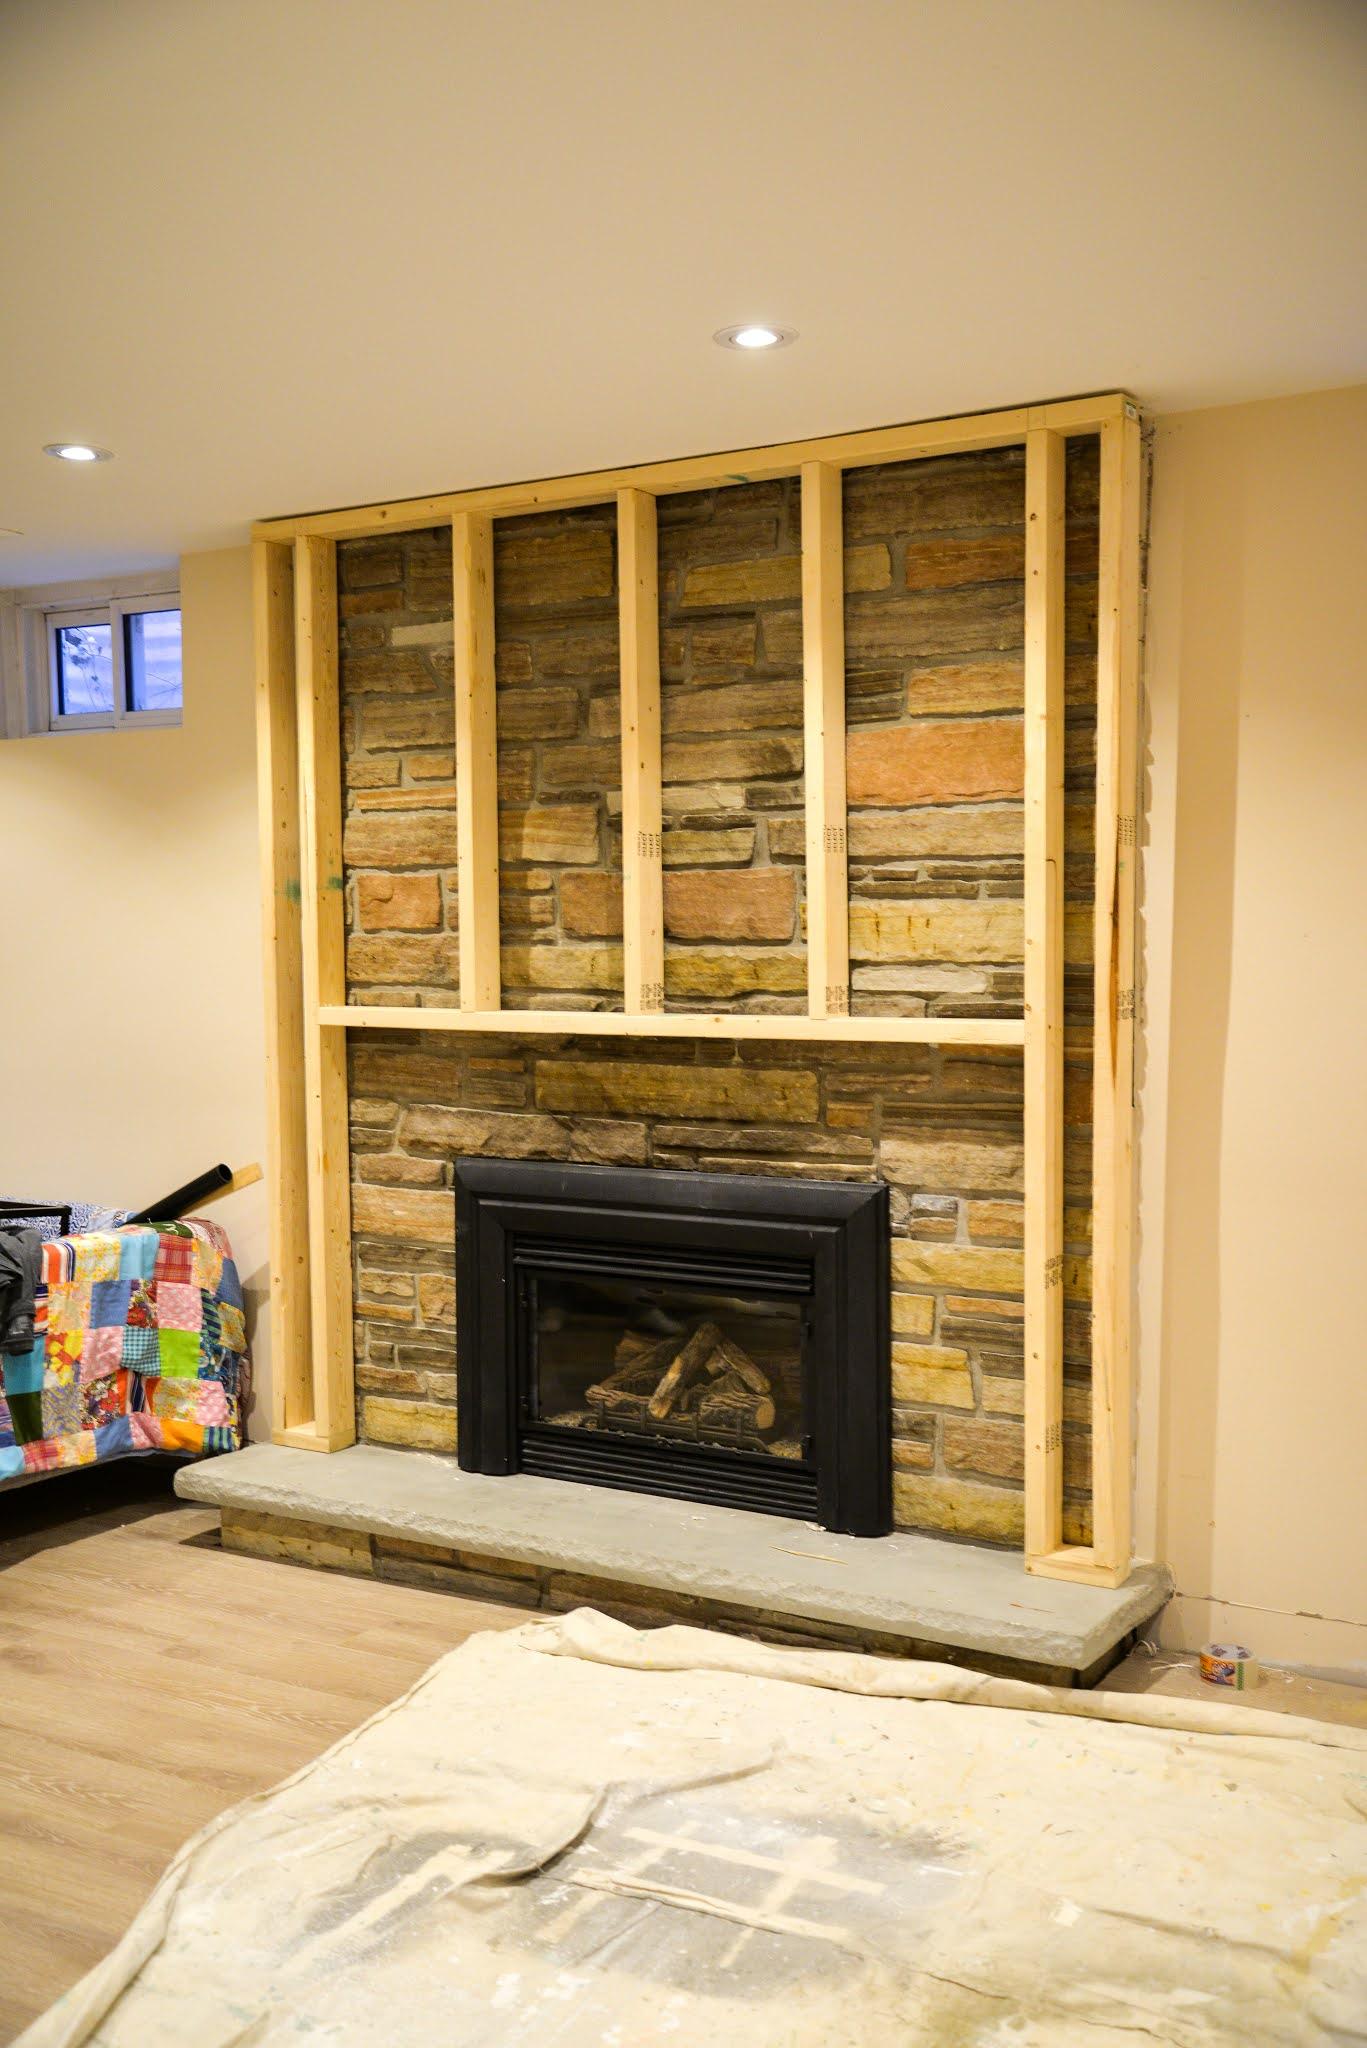 How To Update A Stone Fireplace Rambling Renovators